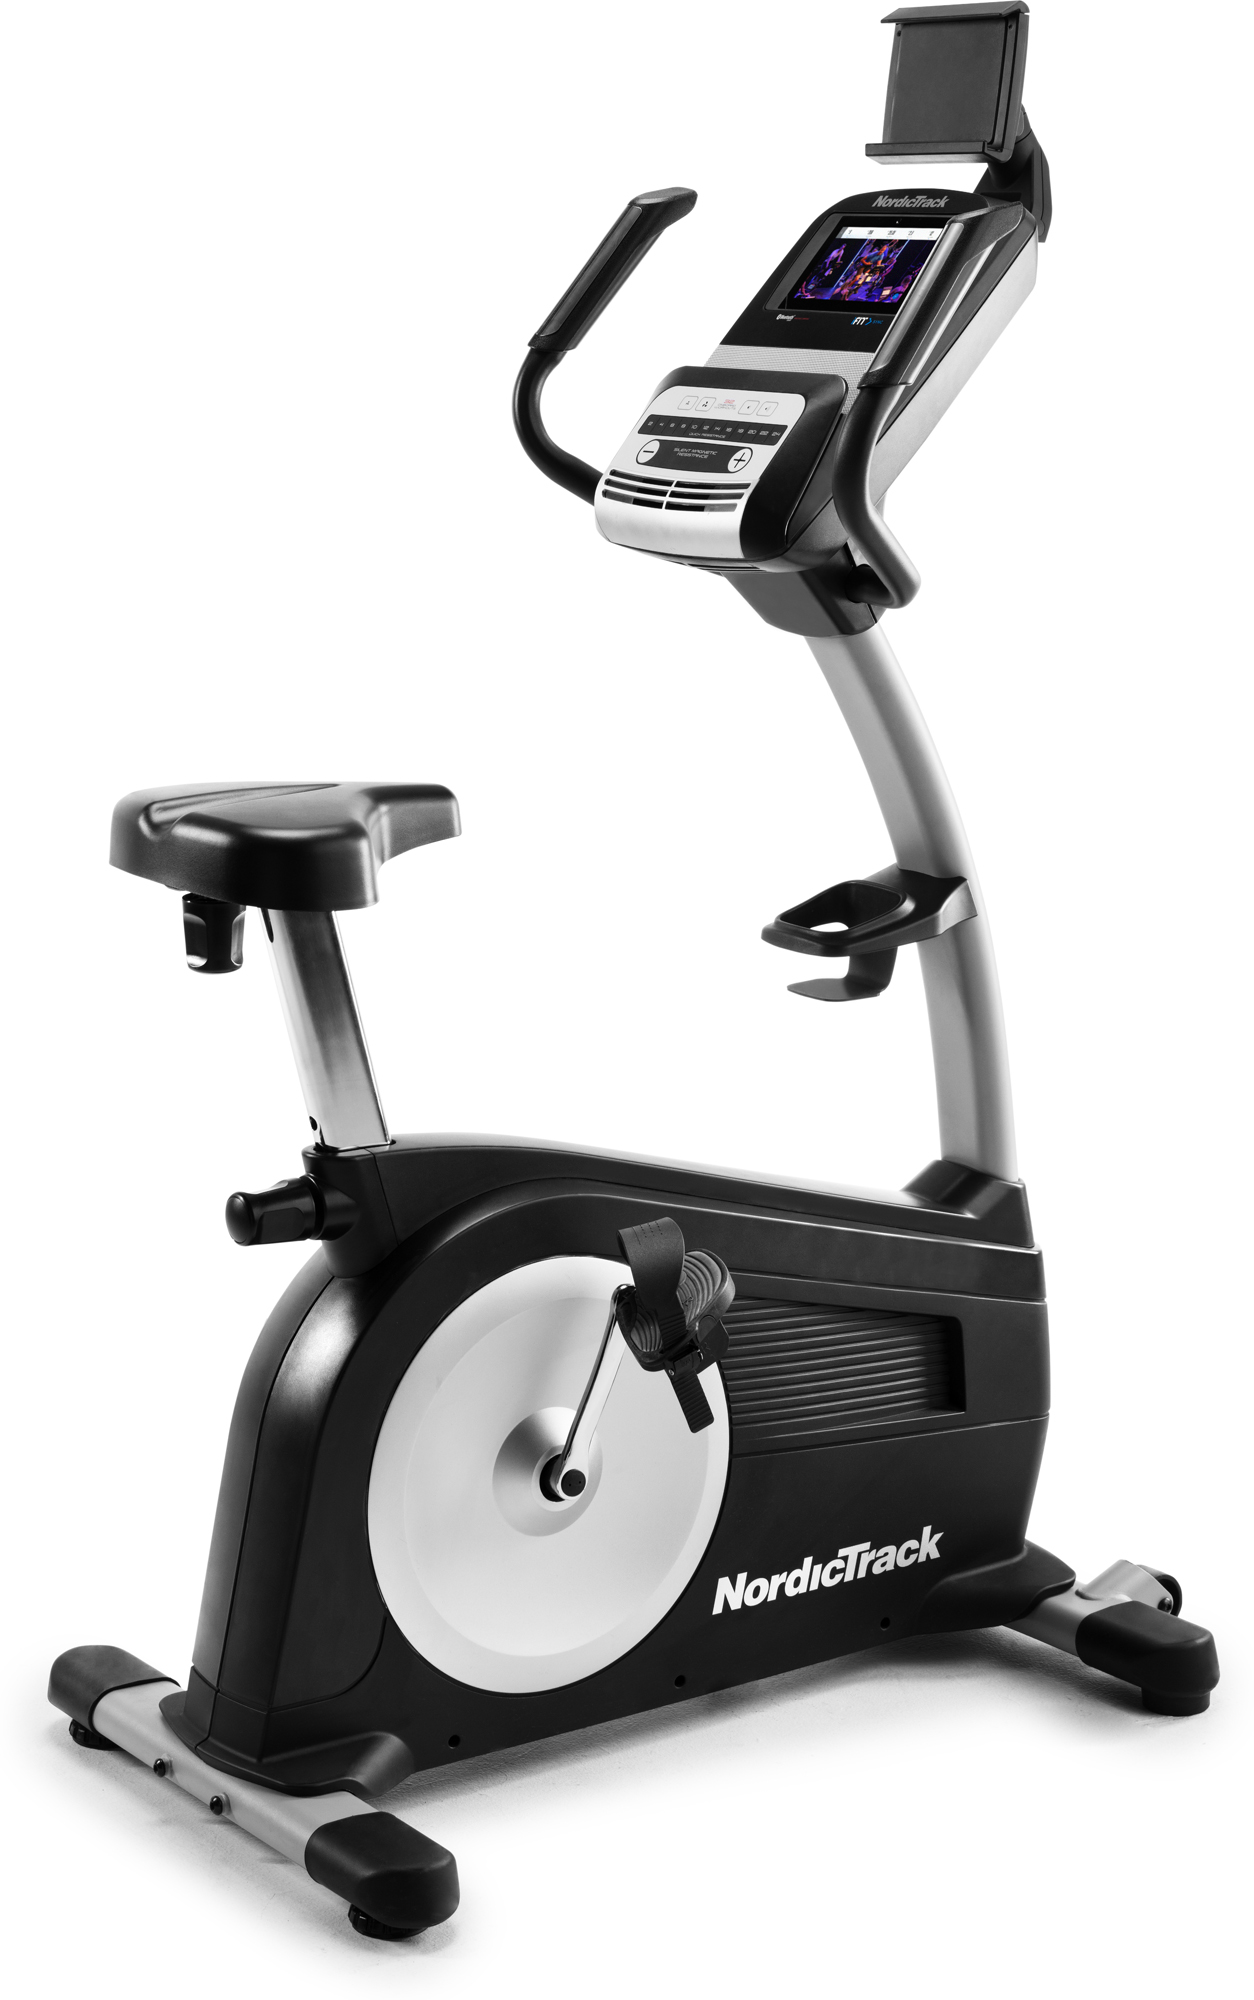 NordicTrack Велотренажер магнитный GX 4.6 Pro цена